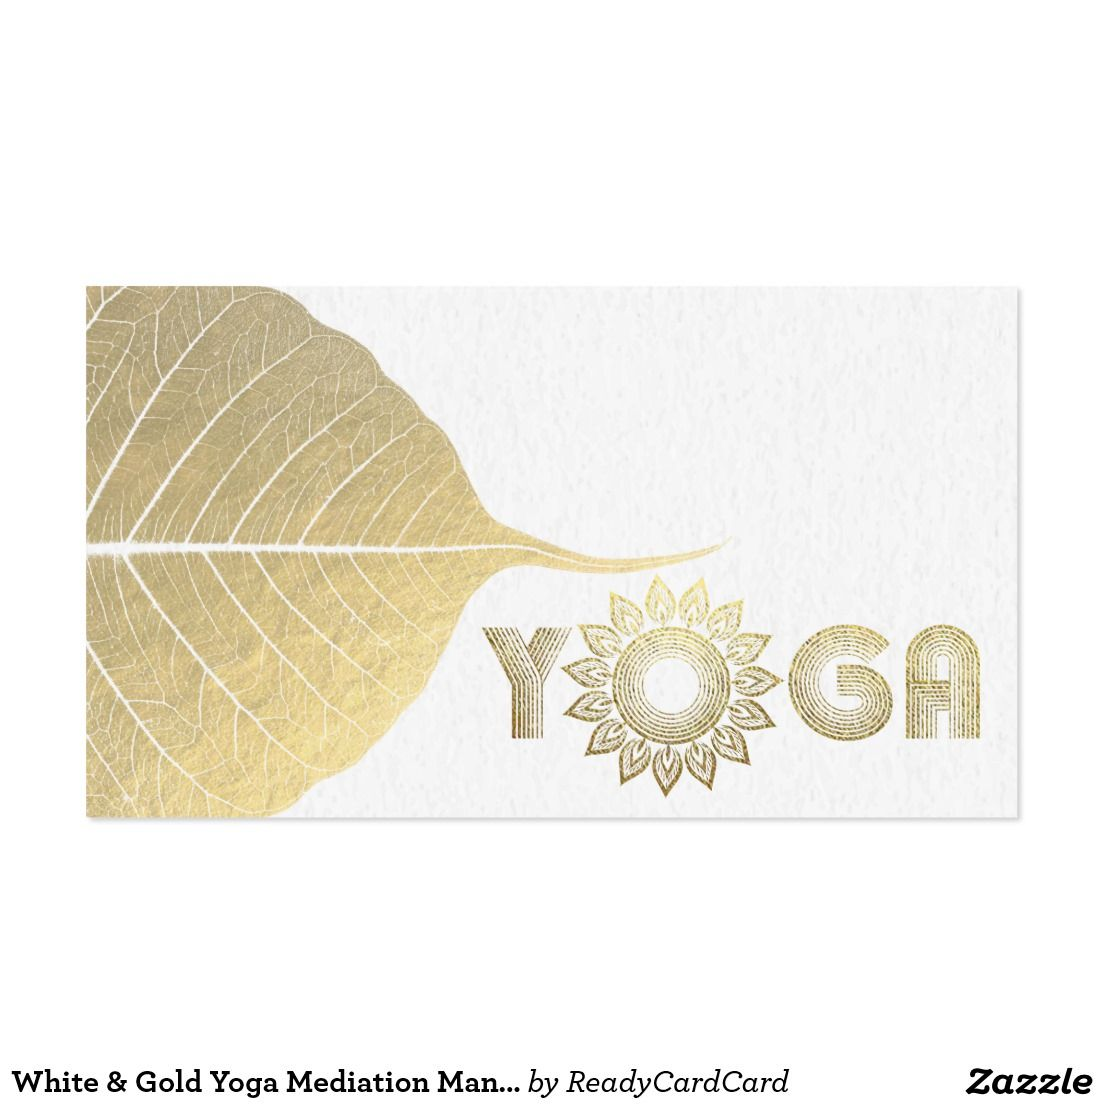 White gold yoga mediation mandala bodhi leaf business card yoga white gold yoga mediation mandala bodhi leaf business card colourmoves